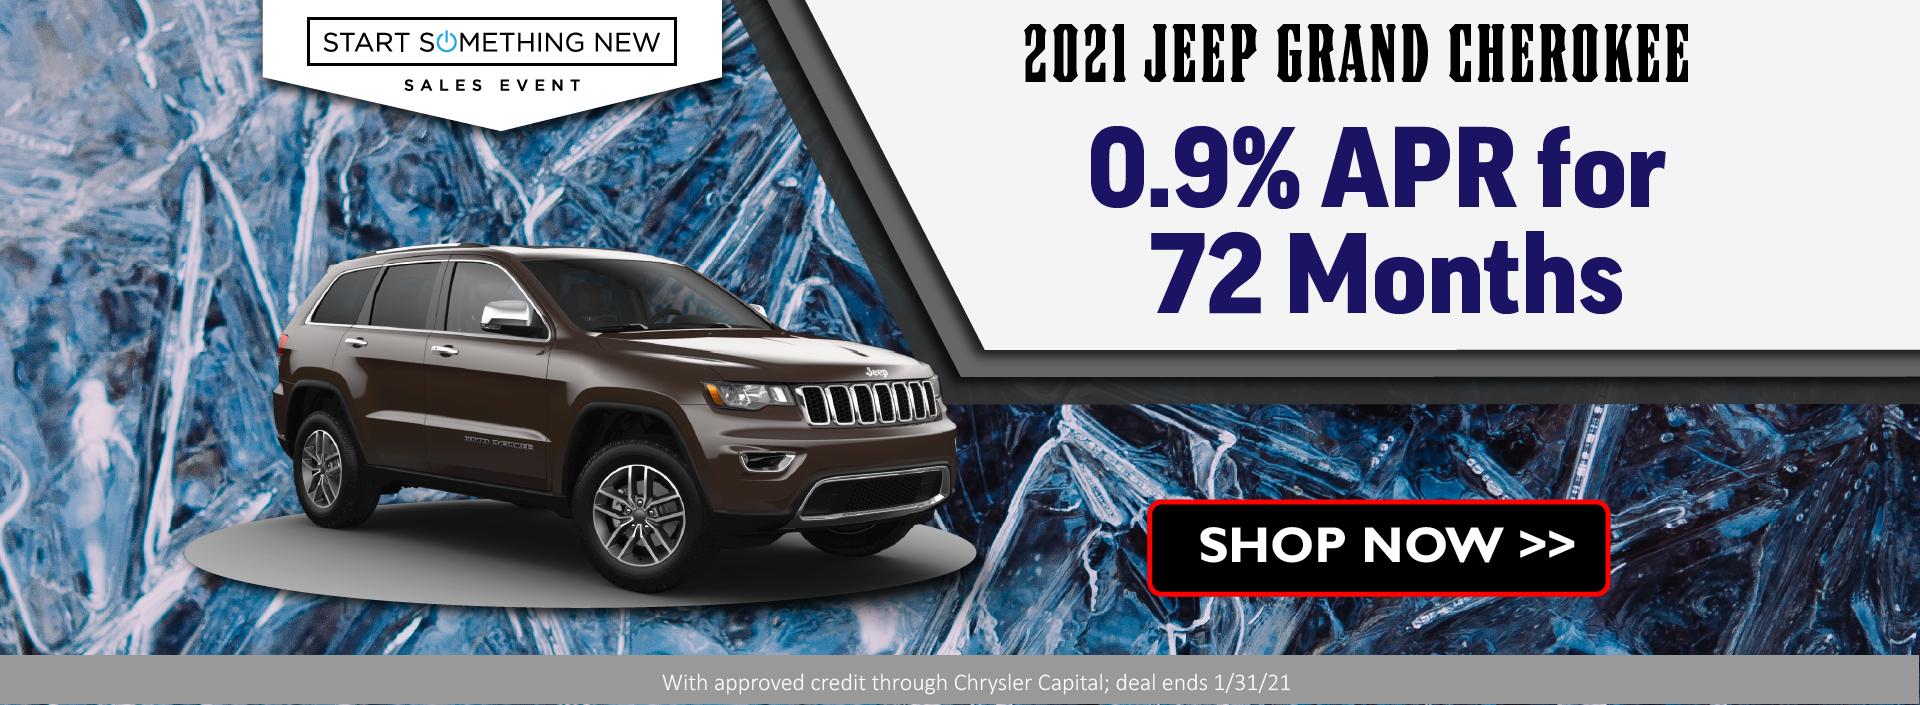 2021 Jeep Grand Cherokee January